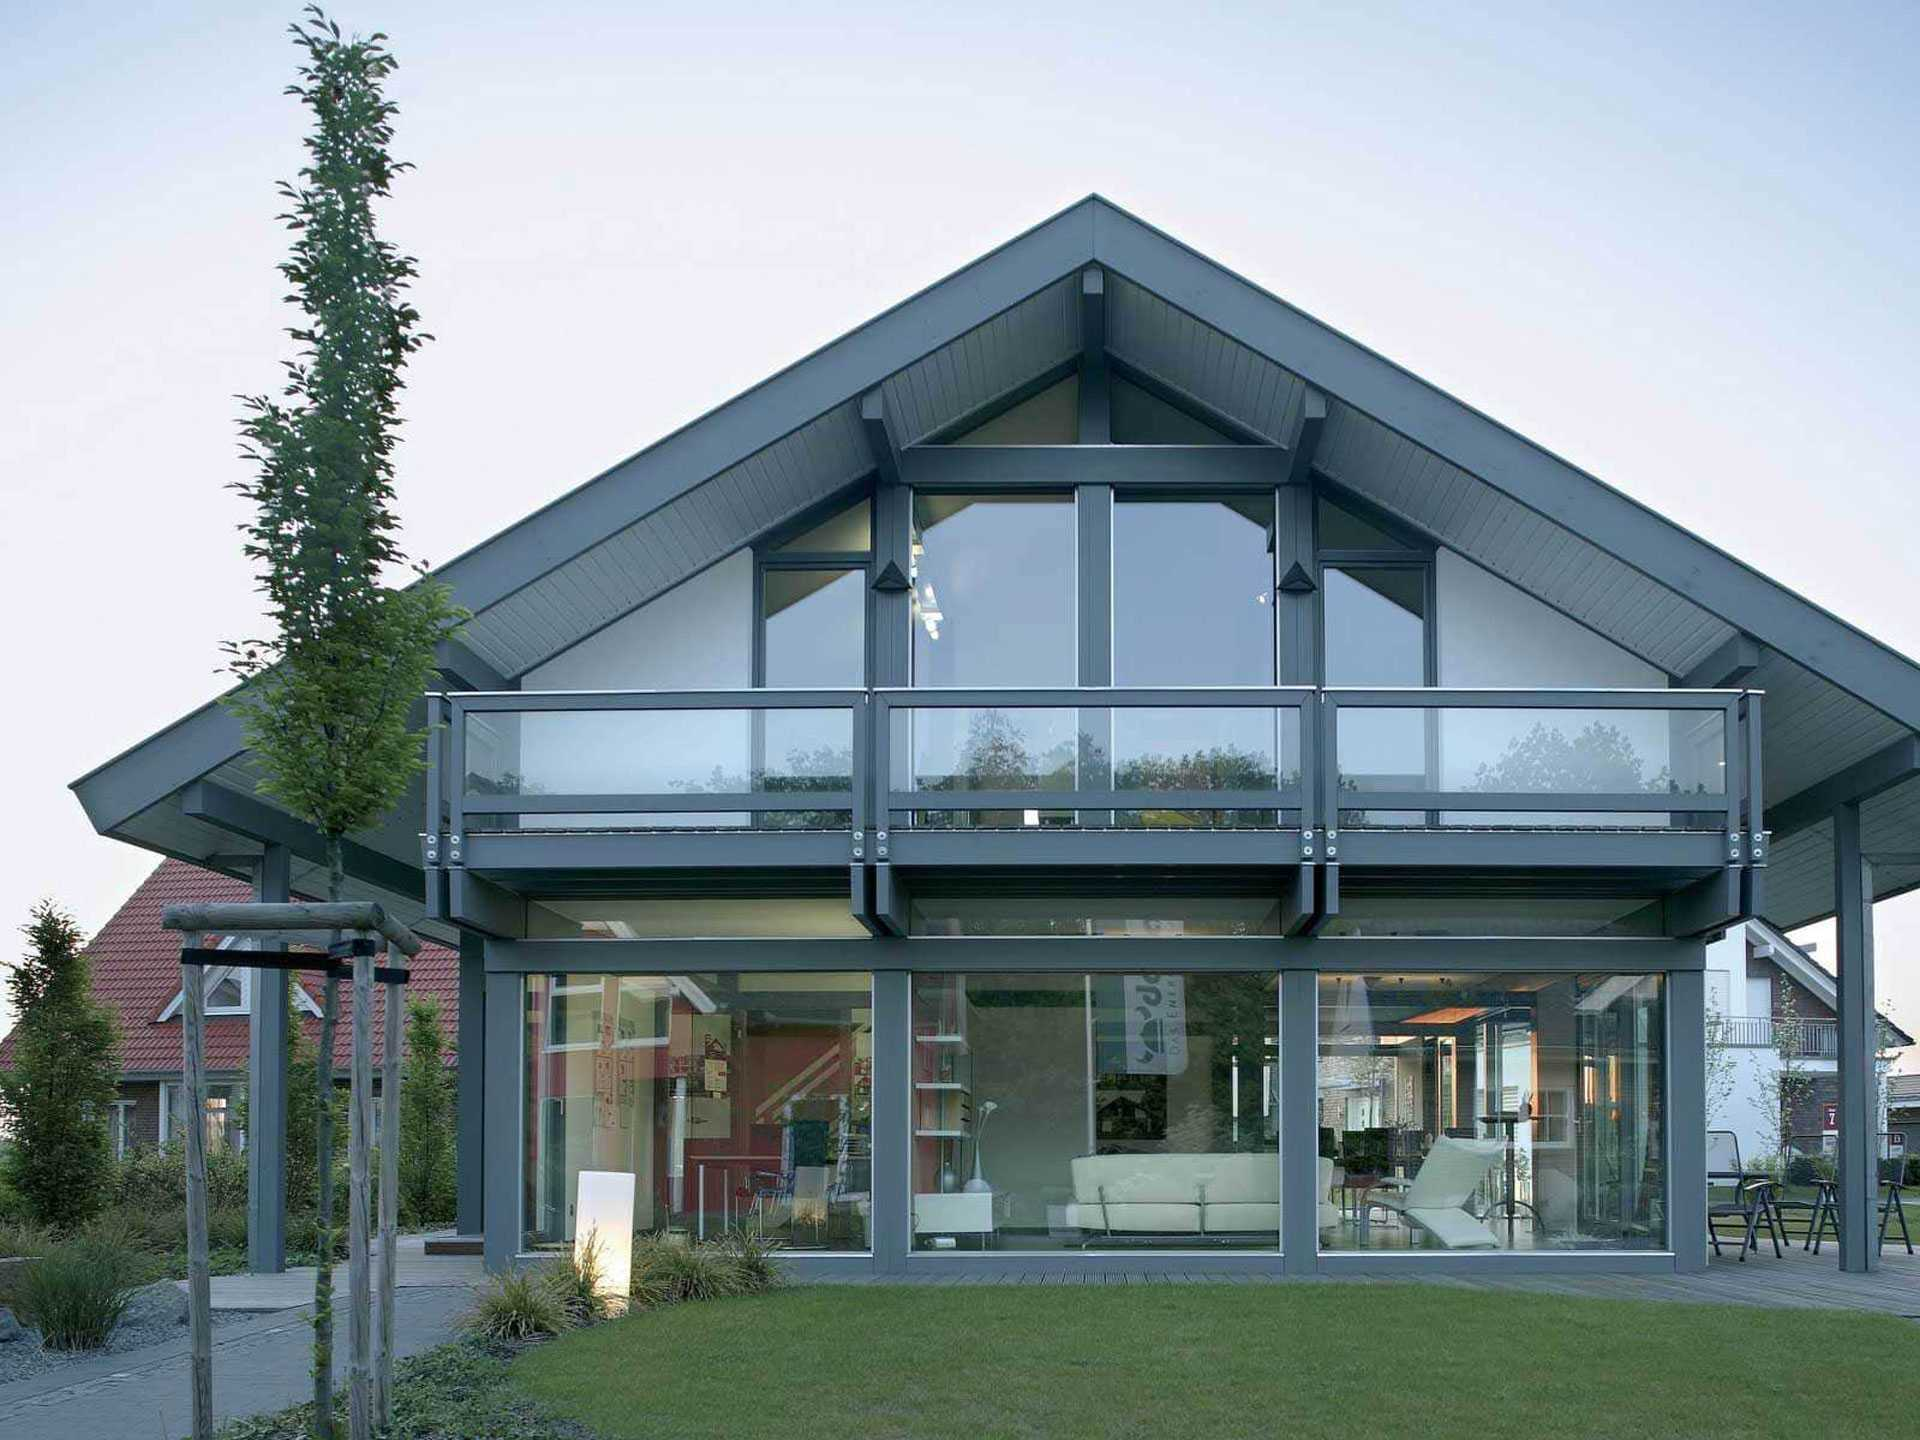 Baufirmen Hannover musterhauspark fertighauswelt am flughafen hannover